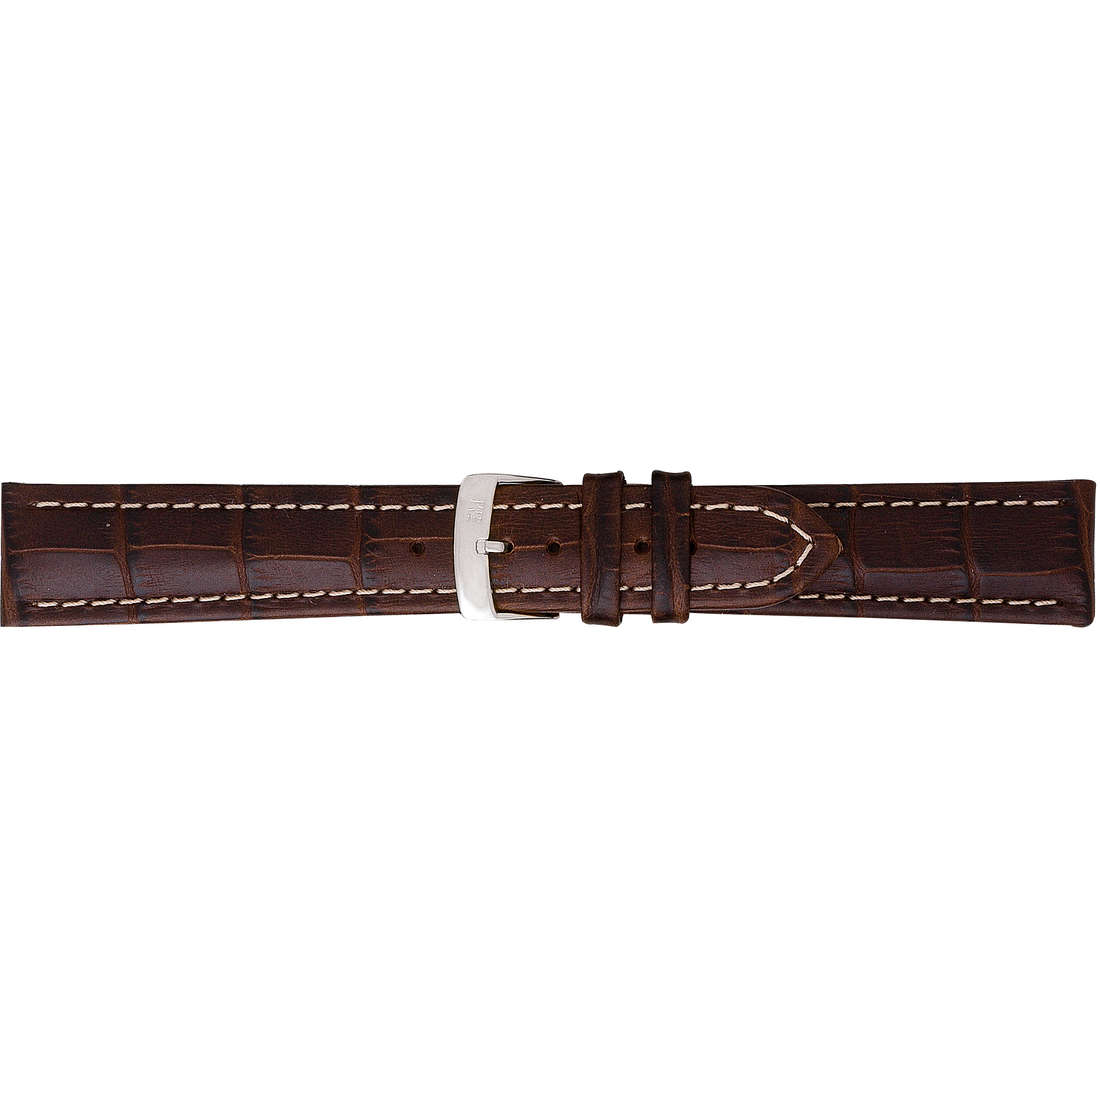 watch watch bands watch straps man Morellato Morellato 1930 A01U3252480032CR22